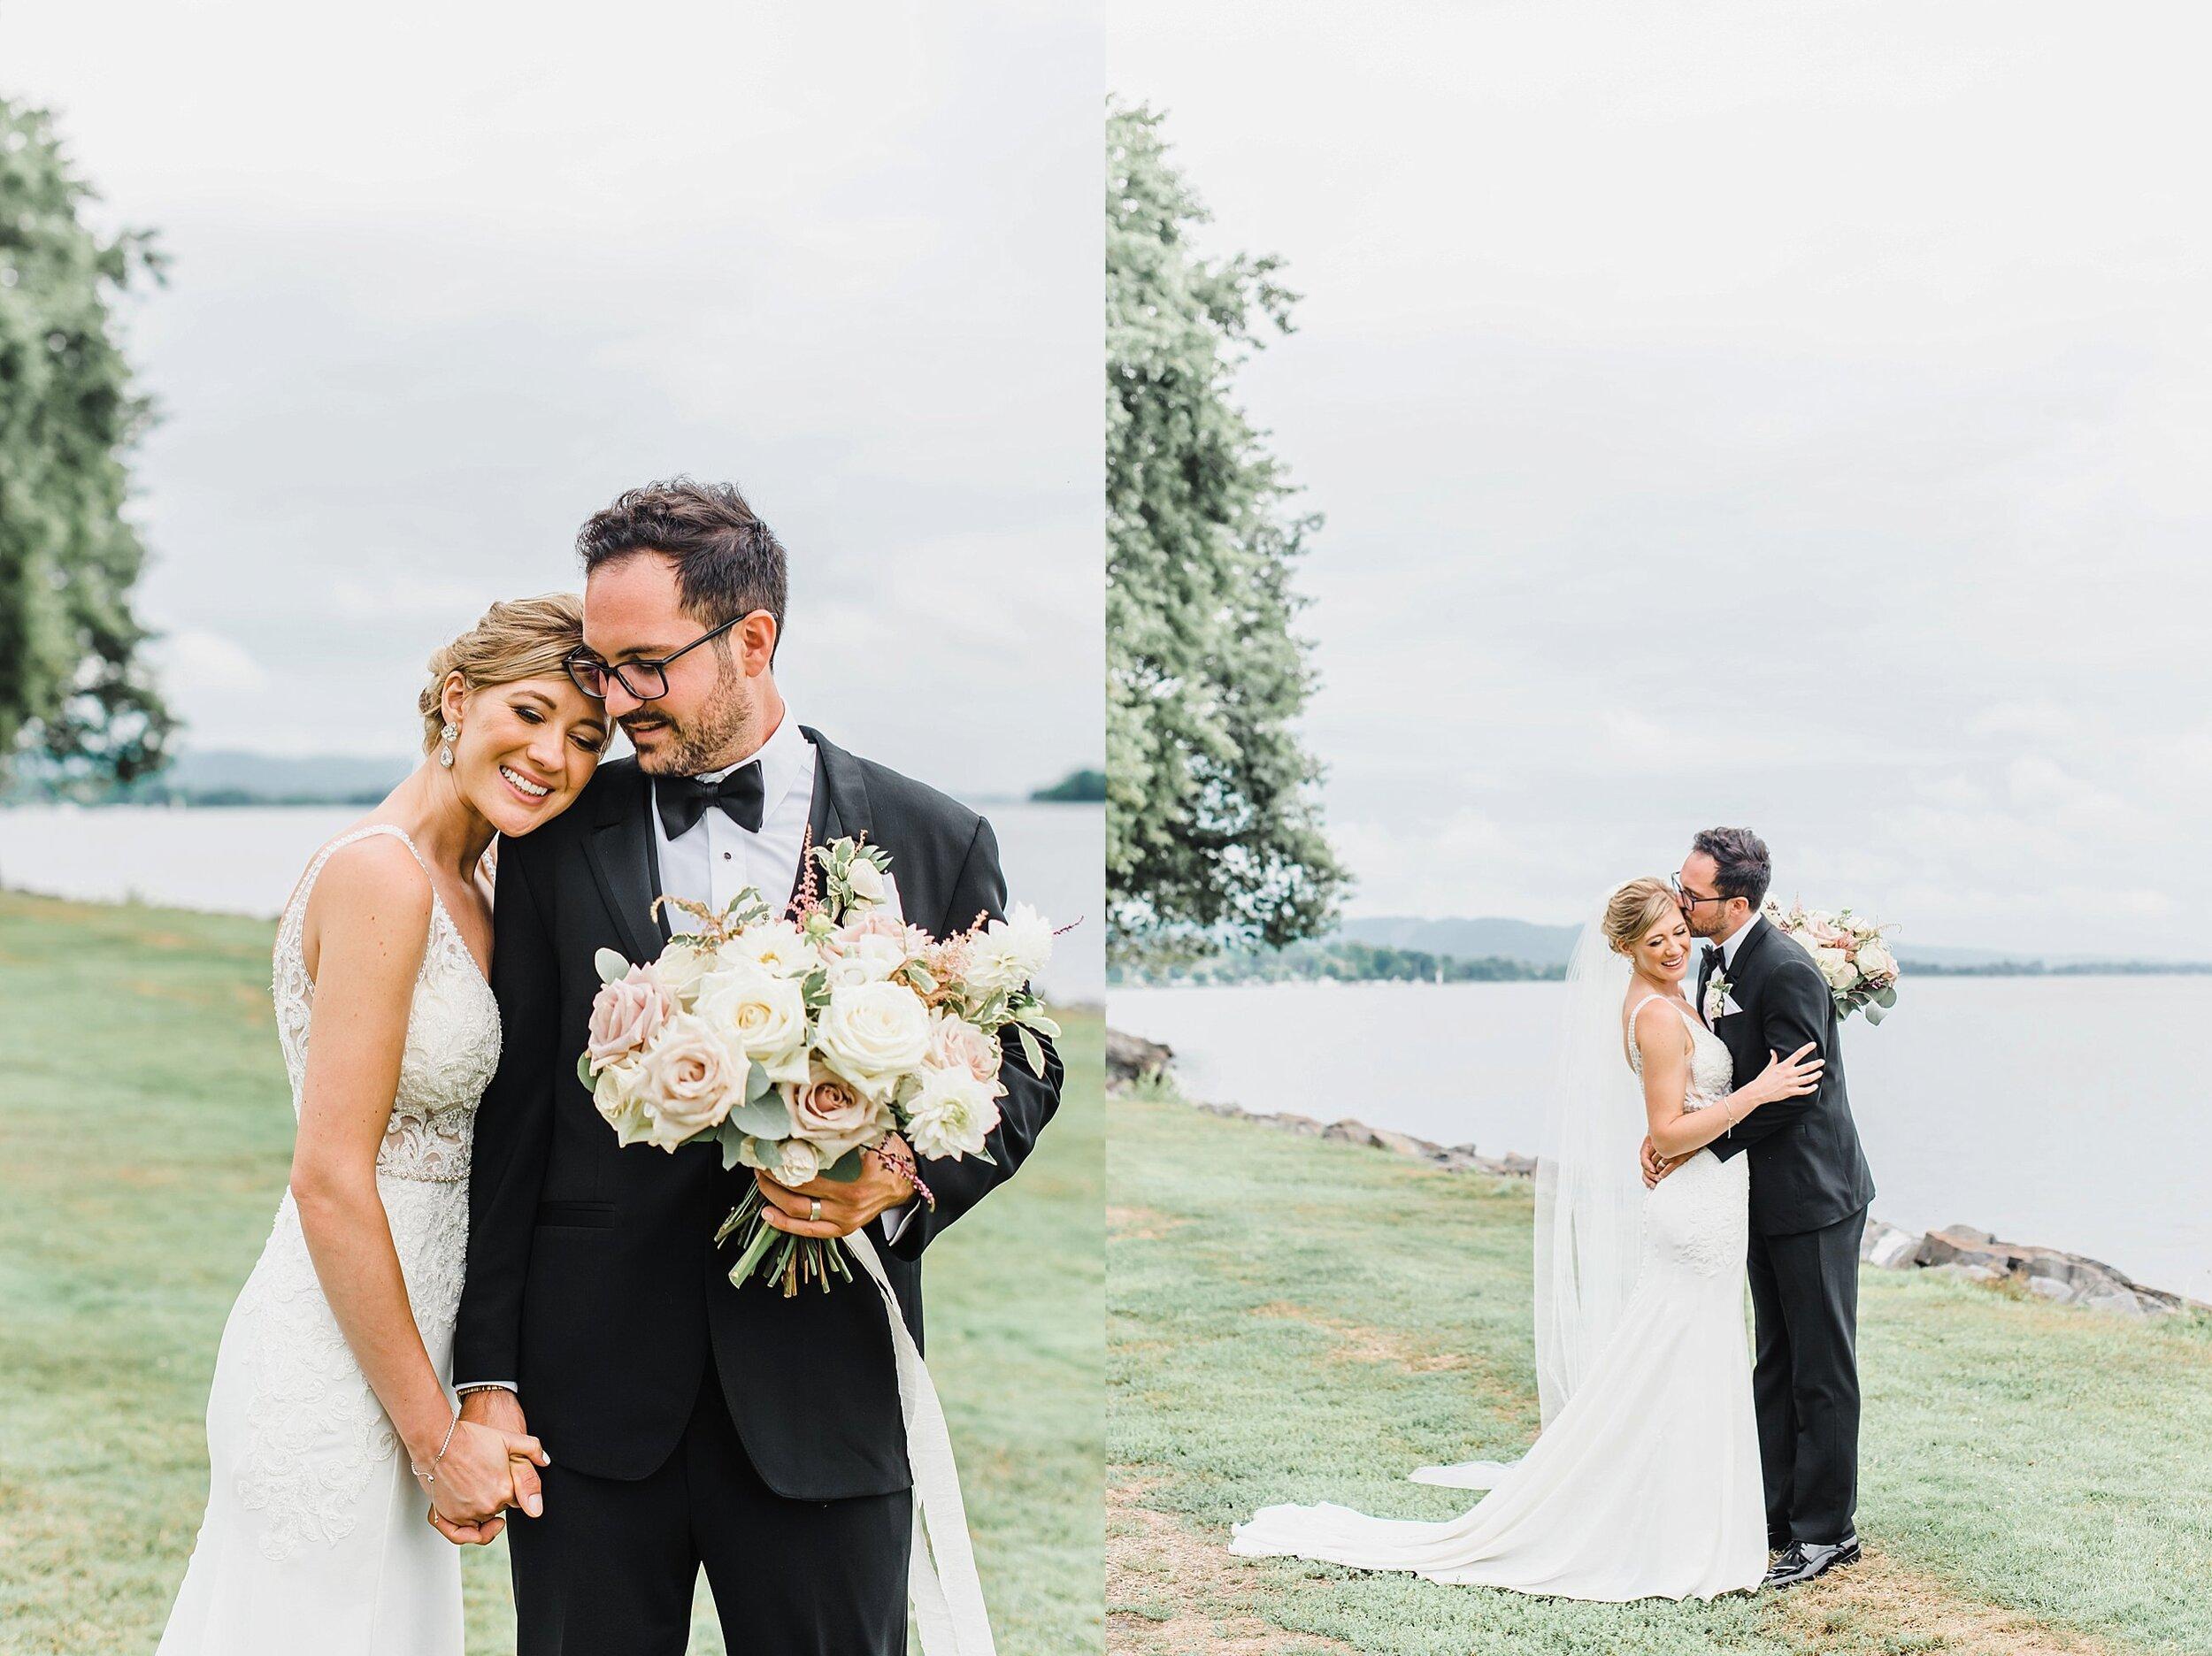 light airy fine art ottawa wedding photographer | Ali and Batoul Photography | Fairmont Le Chateau Montebello53.jpg